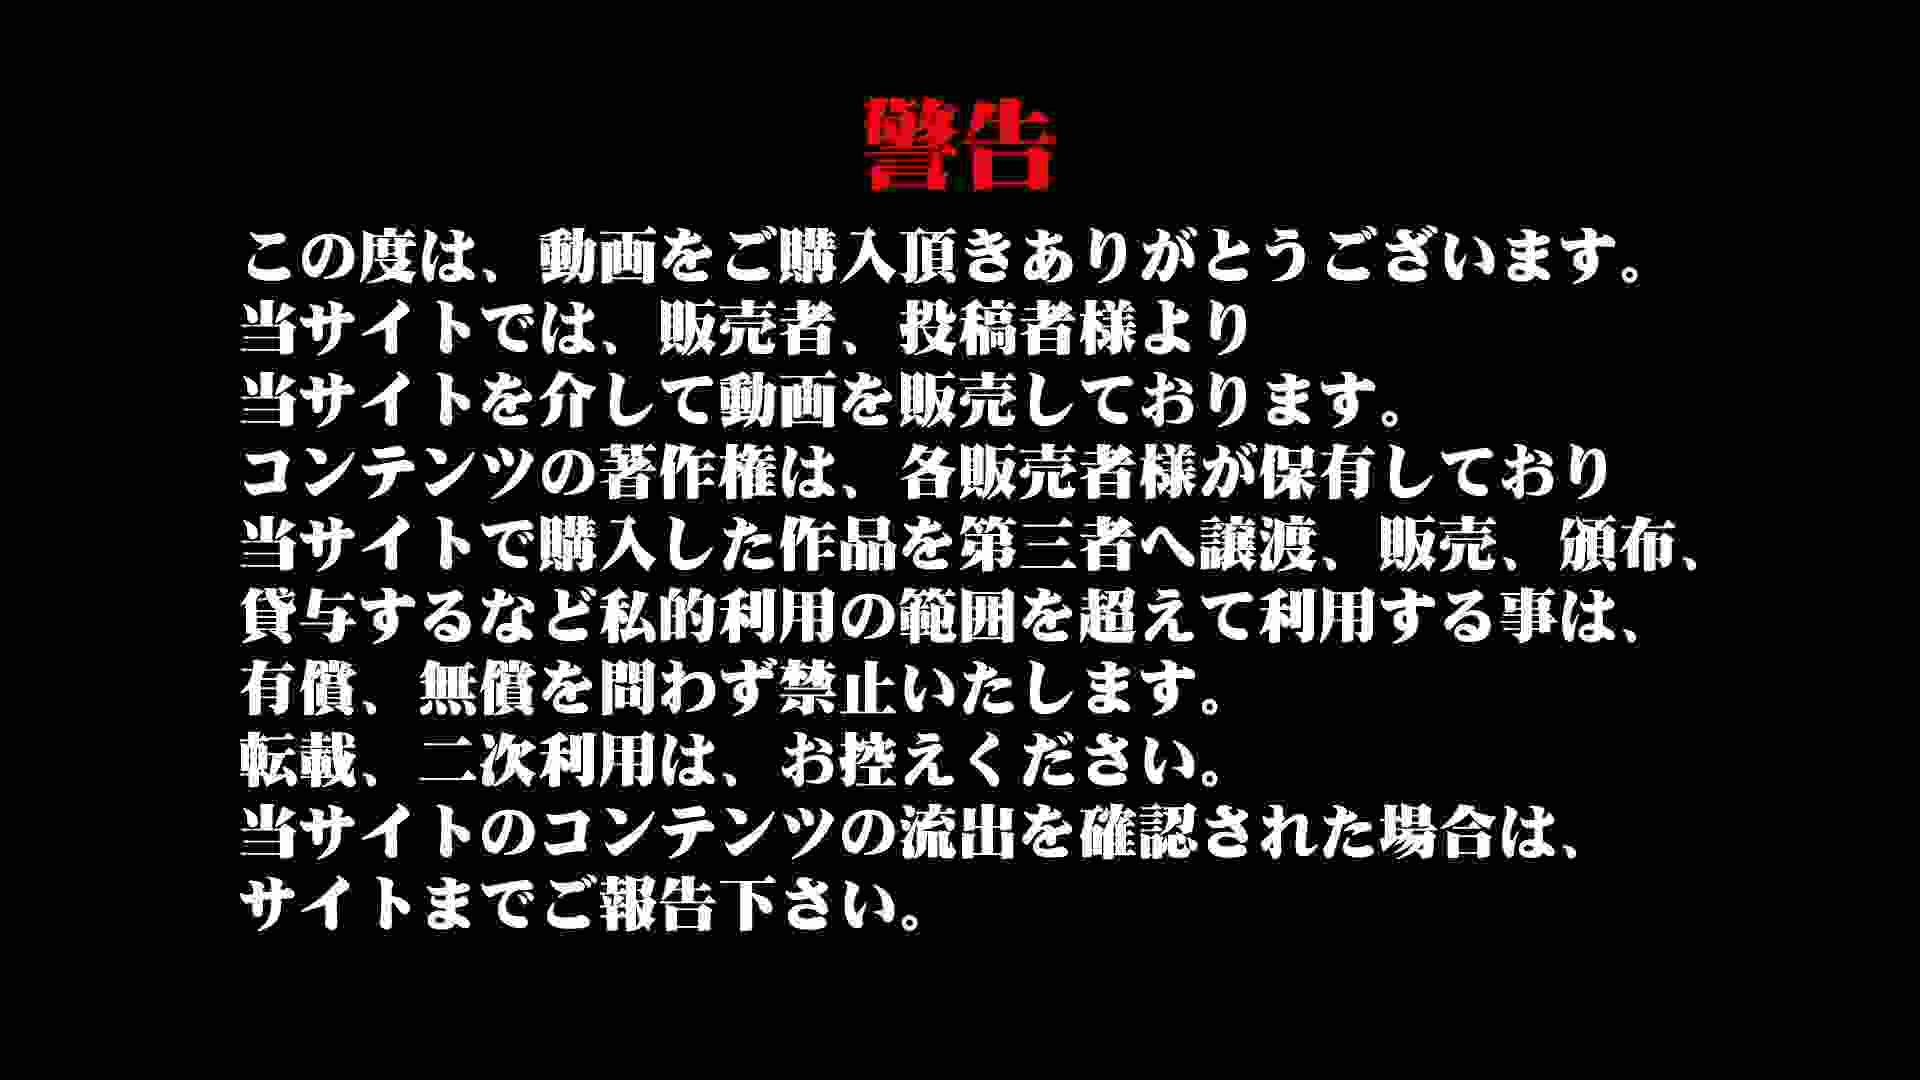 Aquaな露天風呂Vol.894 盗撮シリーズ | 露天風呂編  85PIX 3